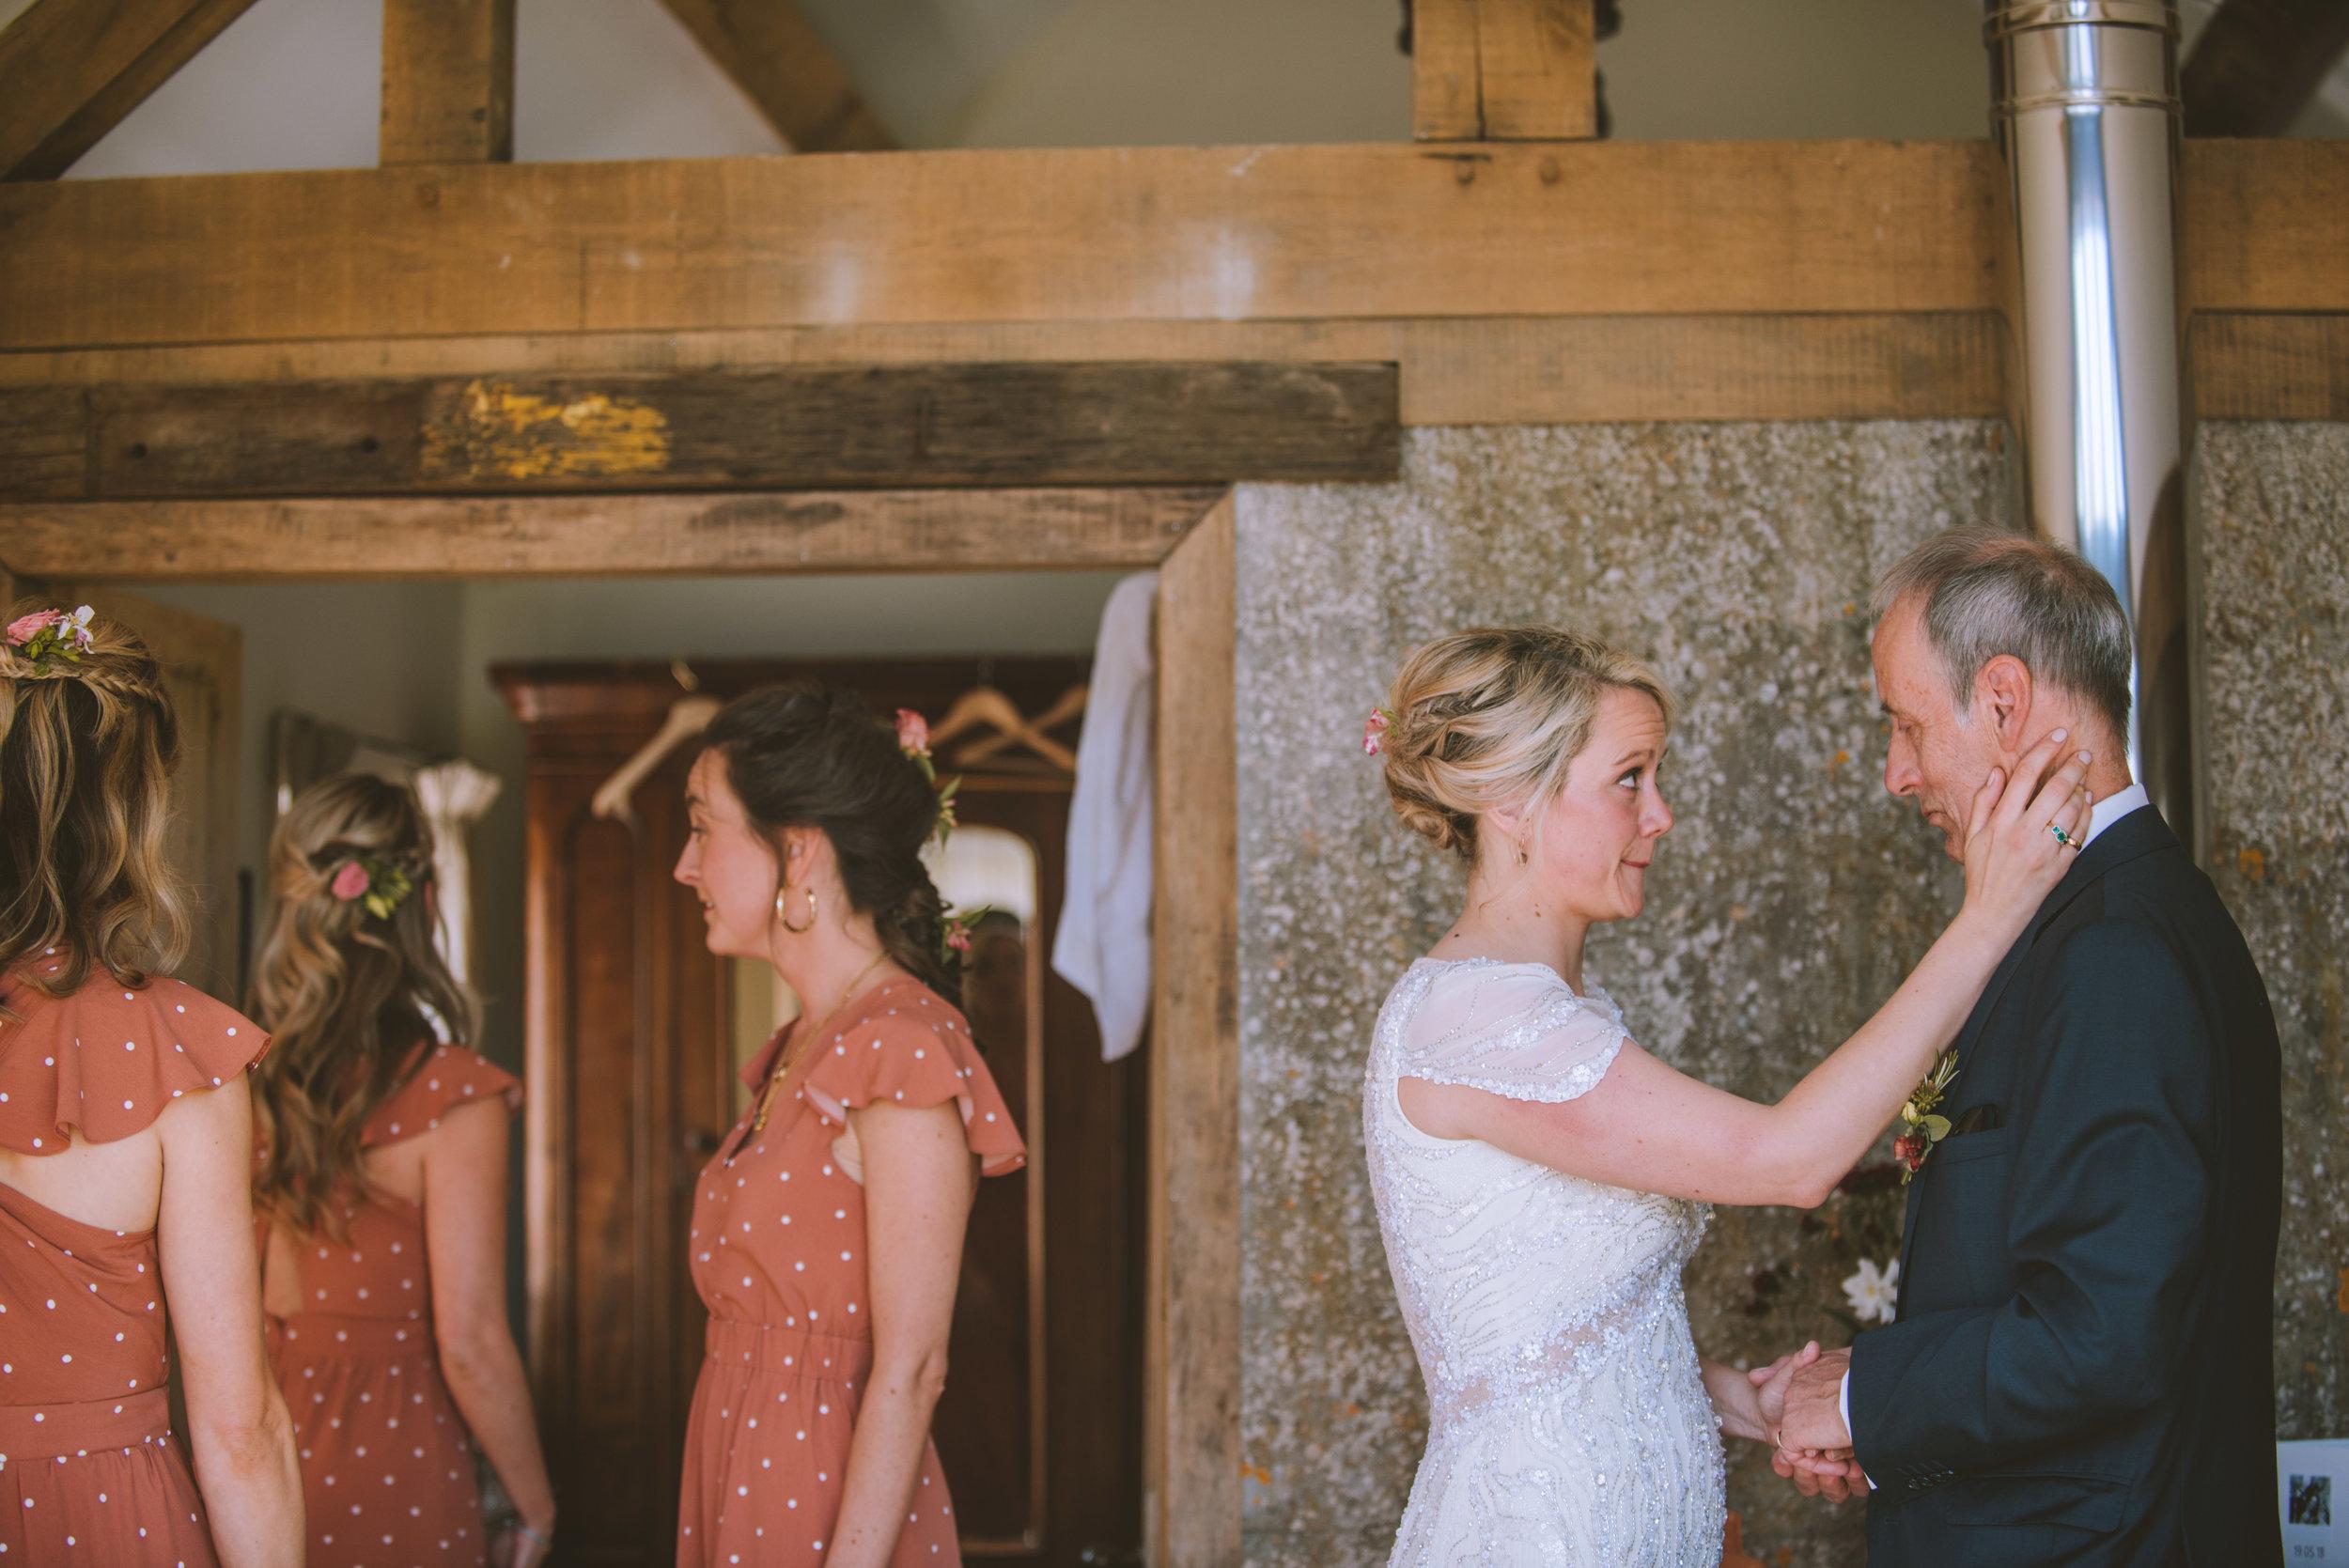 nancarrow-wedding-photography-30.jpg